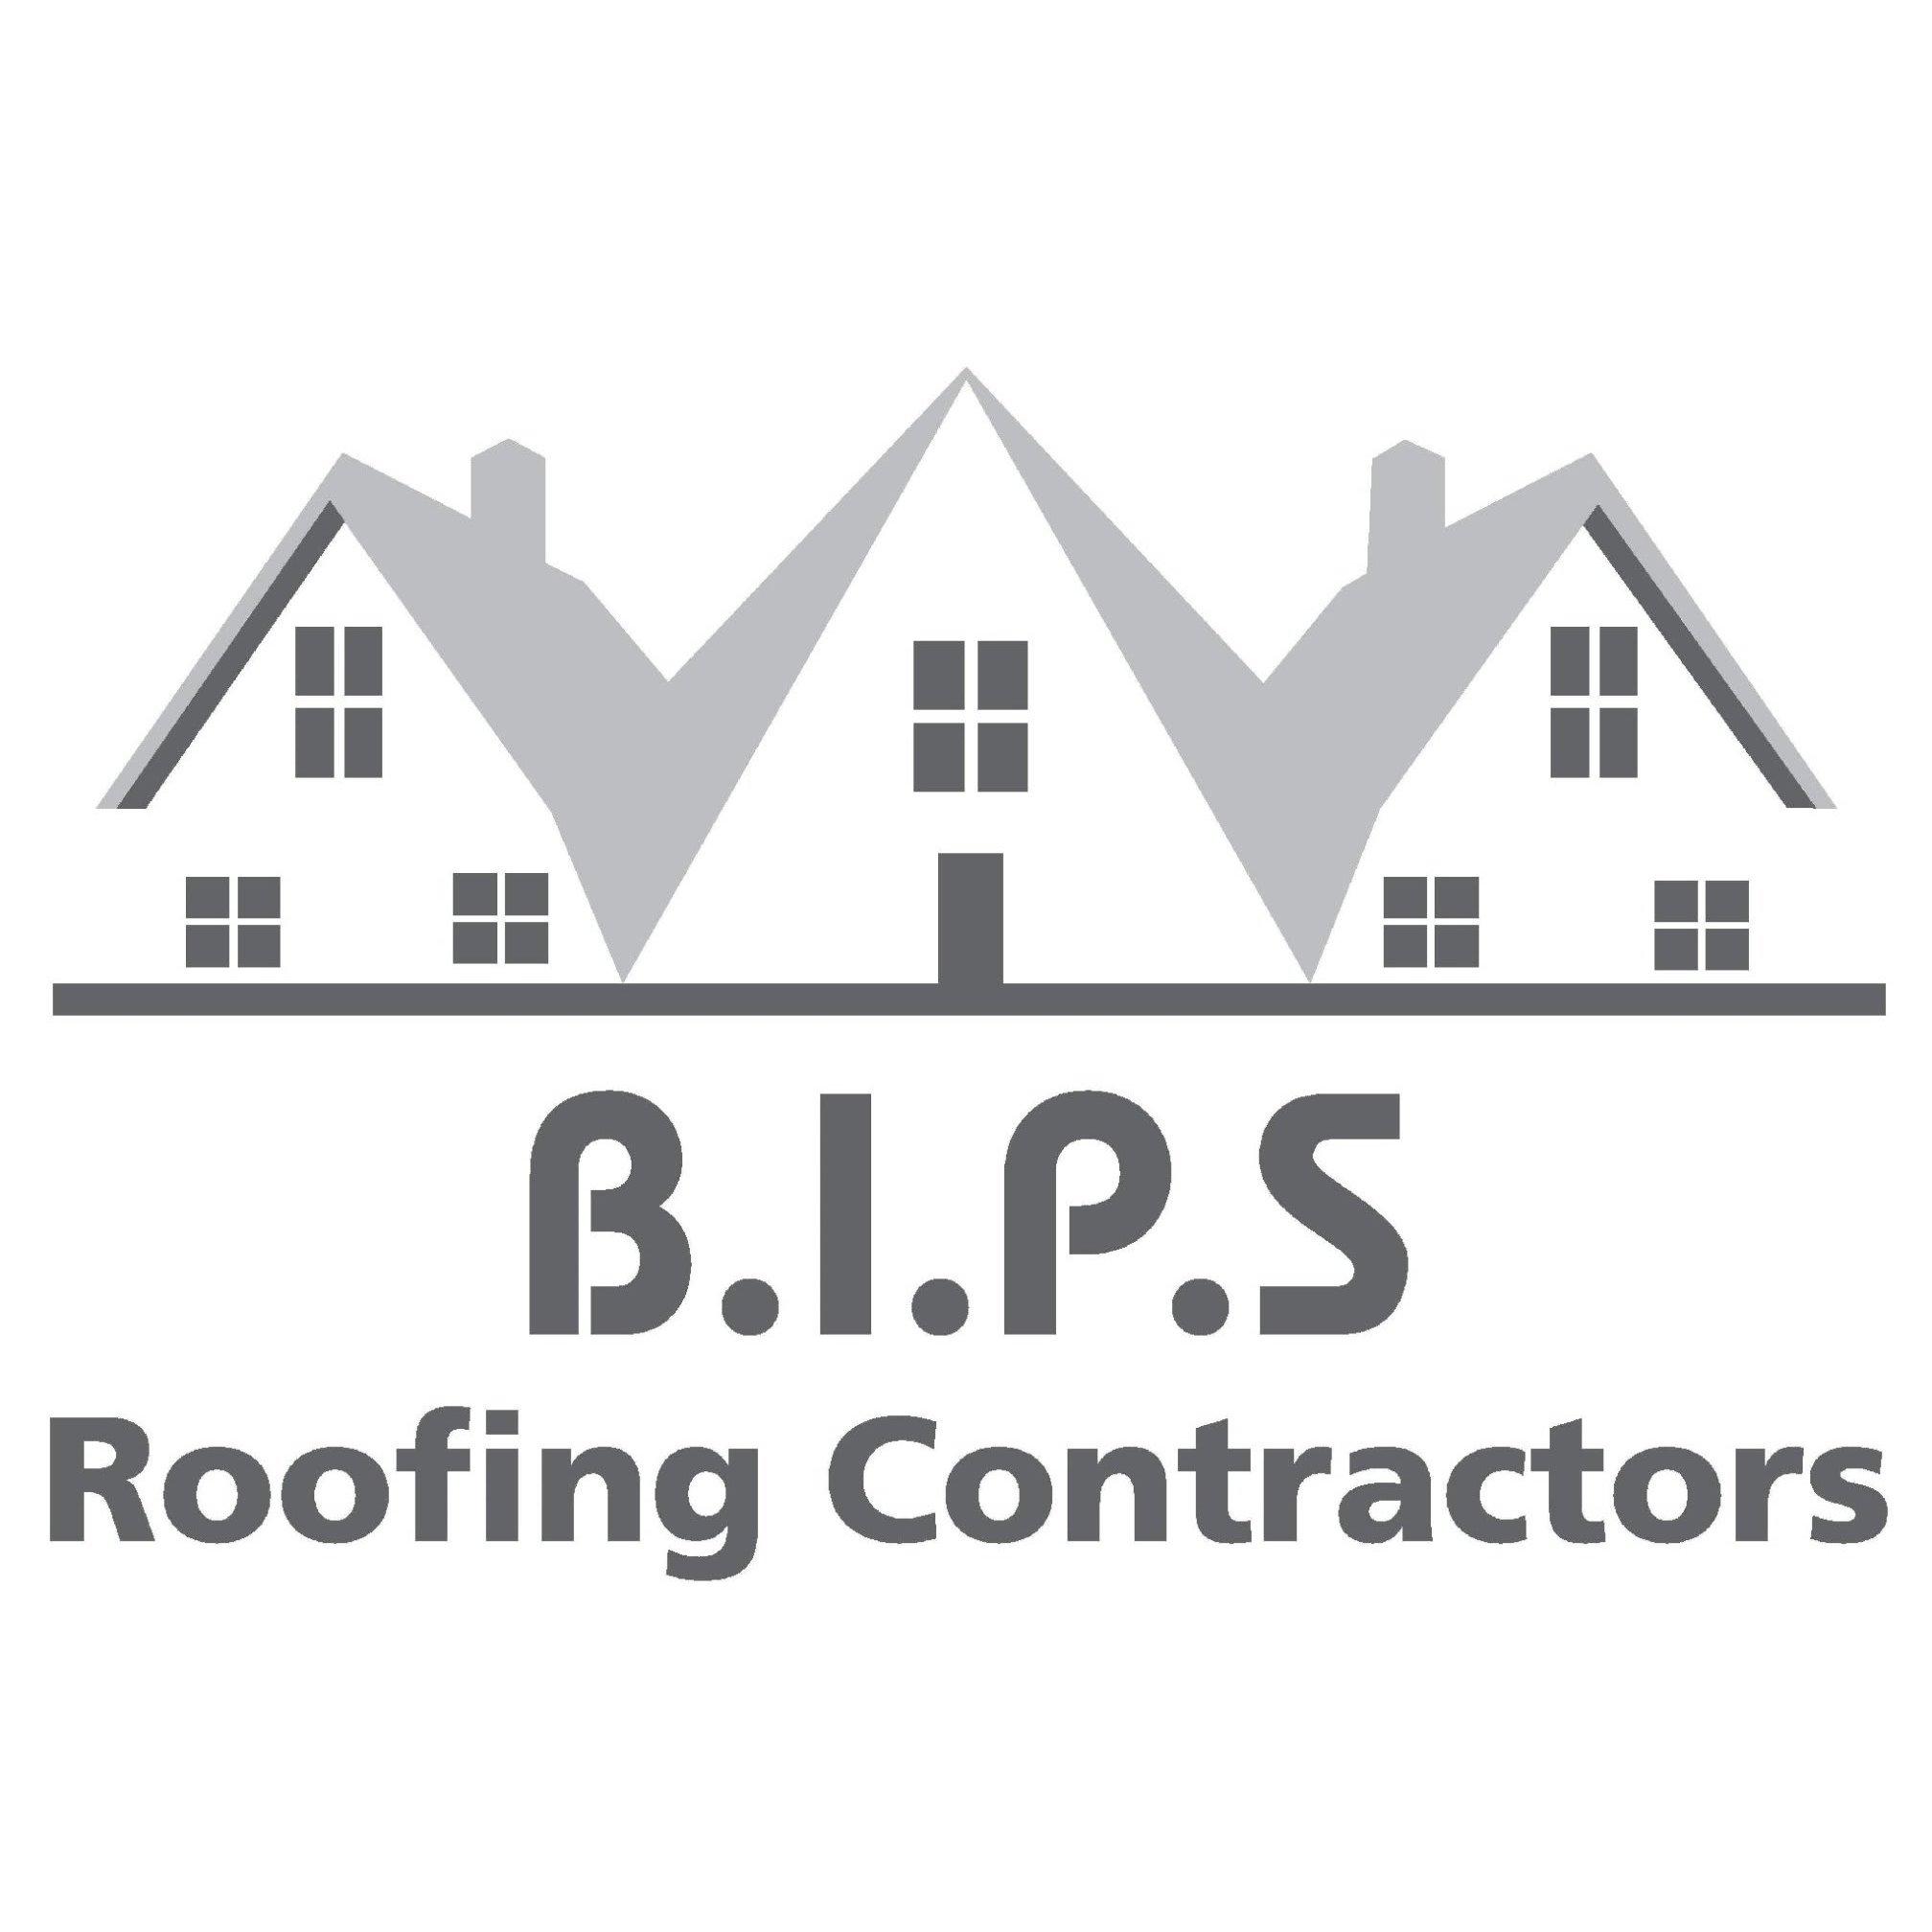 B.I.P.S Roofing Contractors - Dursley, Gloucestershire GL11 5TT - 07578 384984 | ShowMeLocal.com